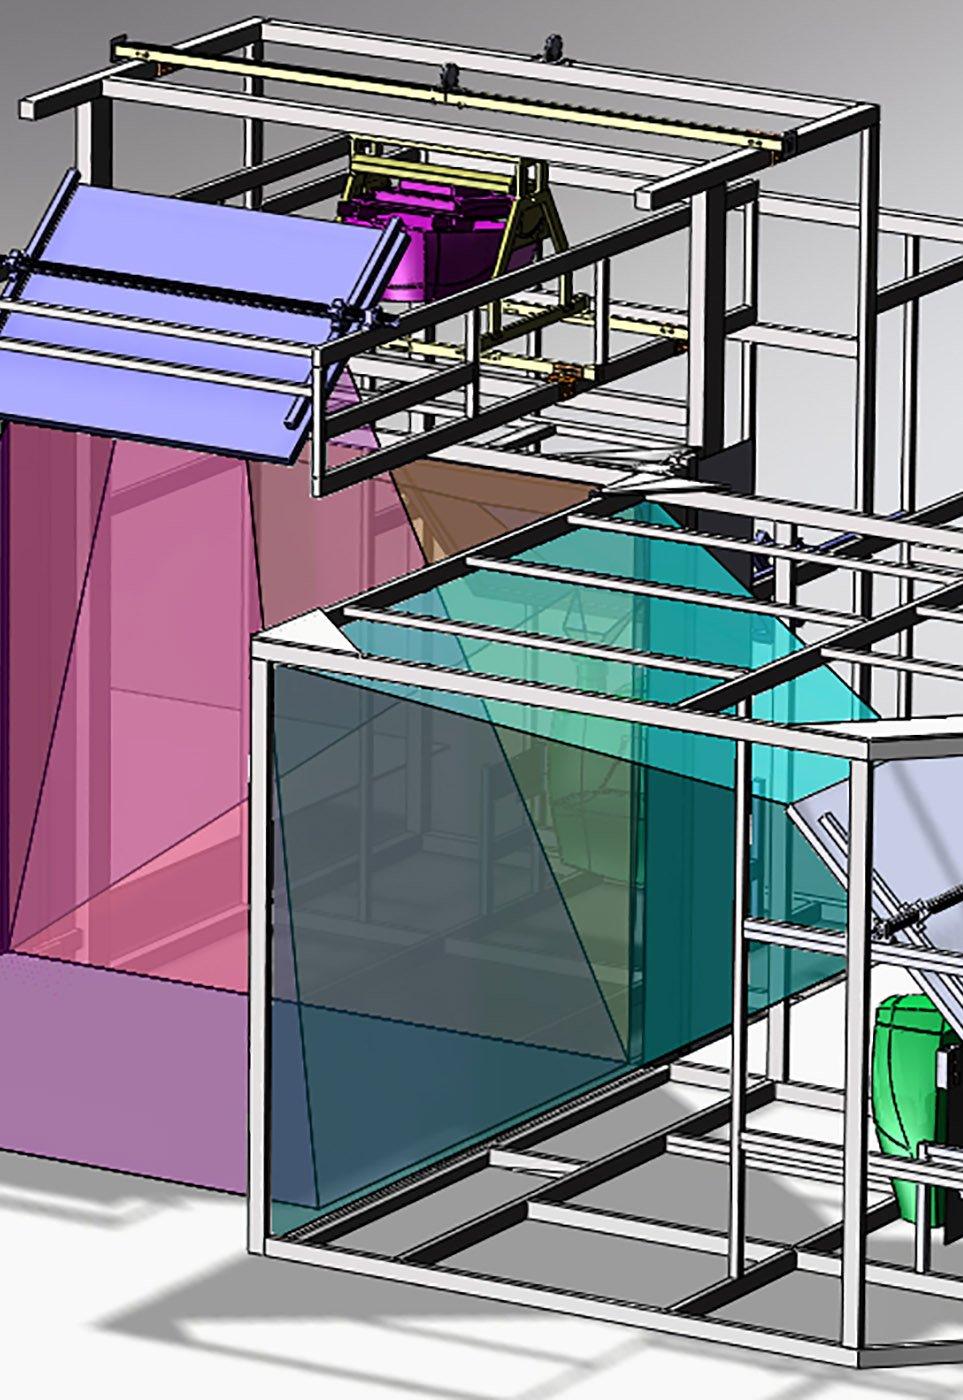 IGI custom design 3D projection CAVE rendering